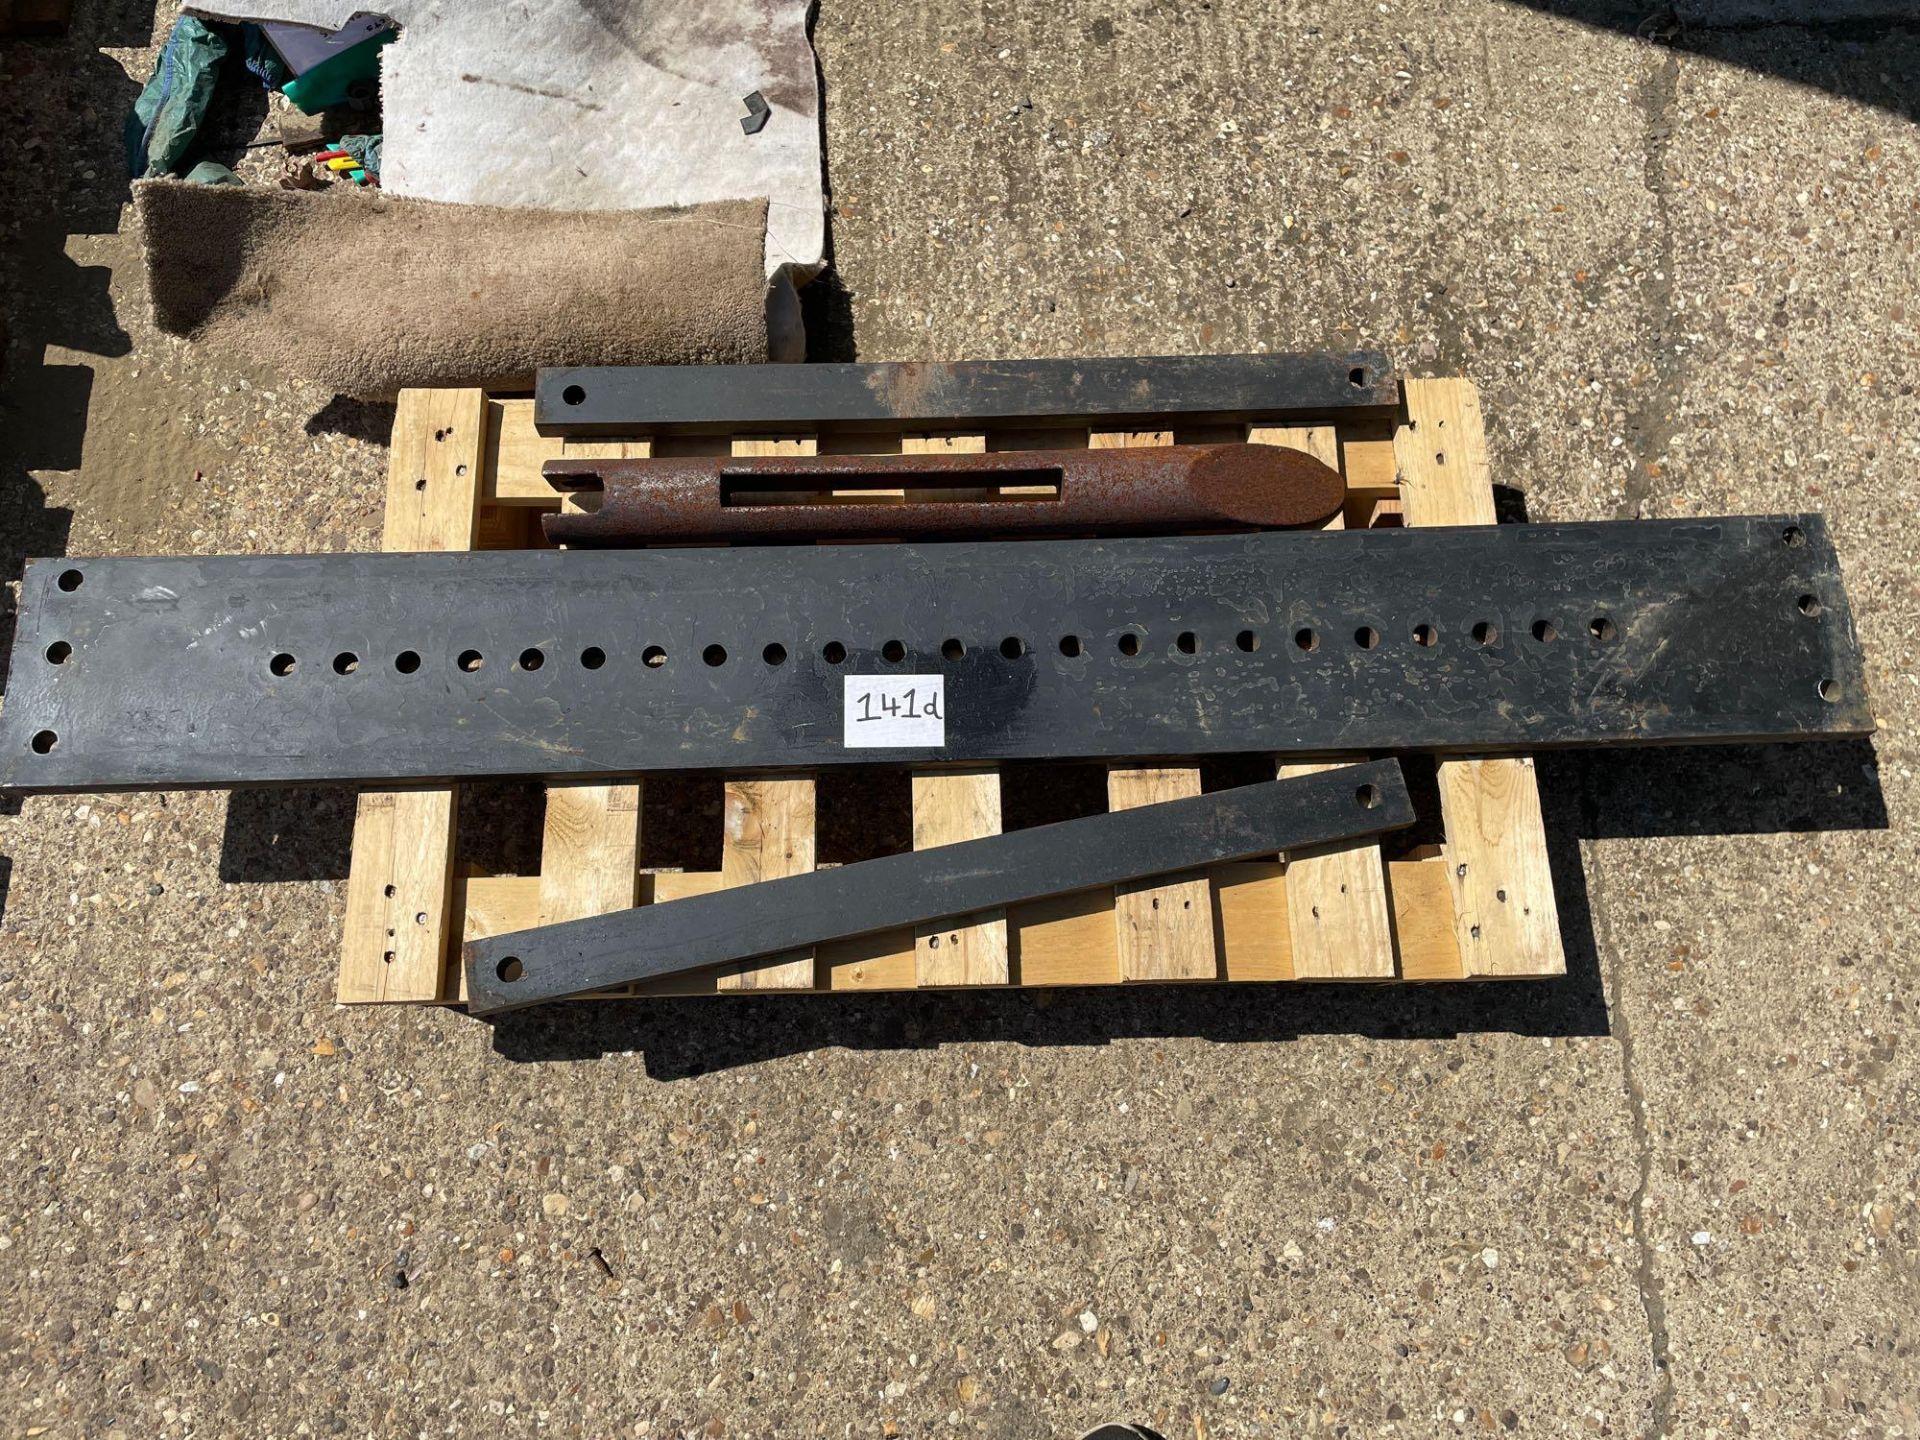 Quantity of Proforge mole plough spares